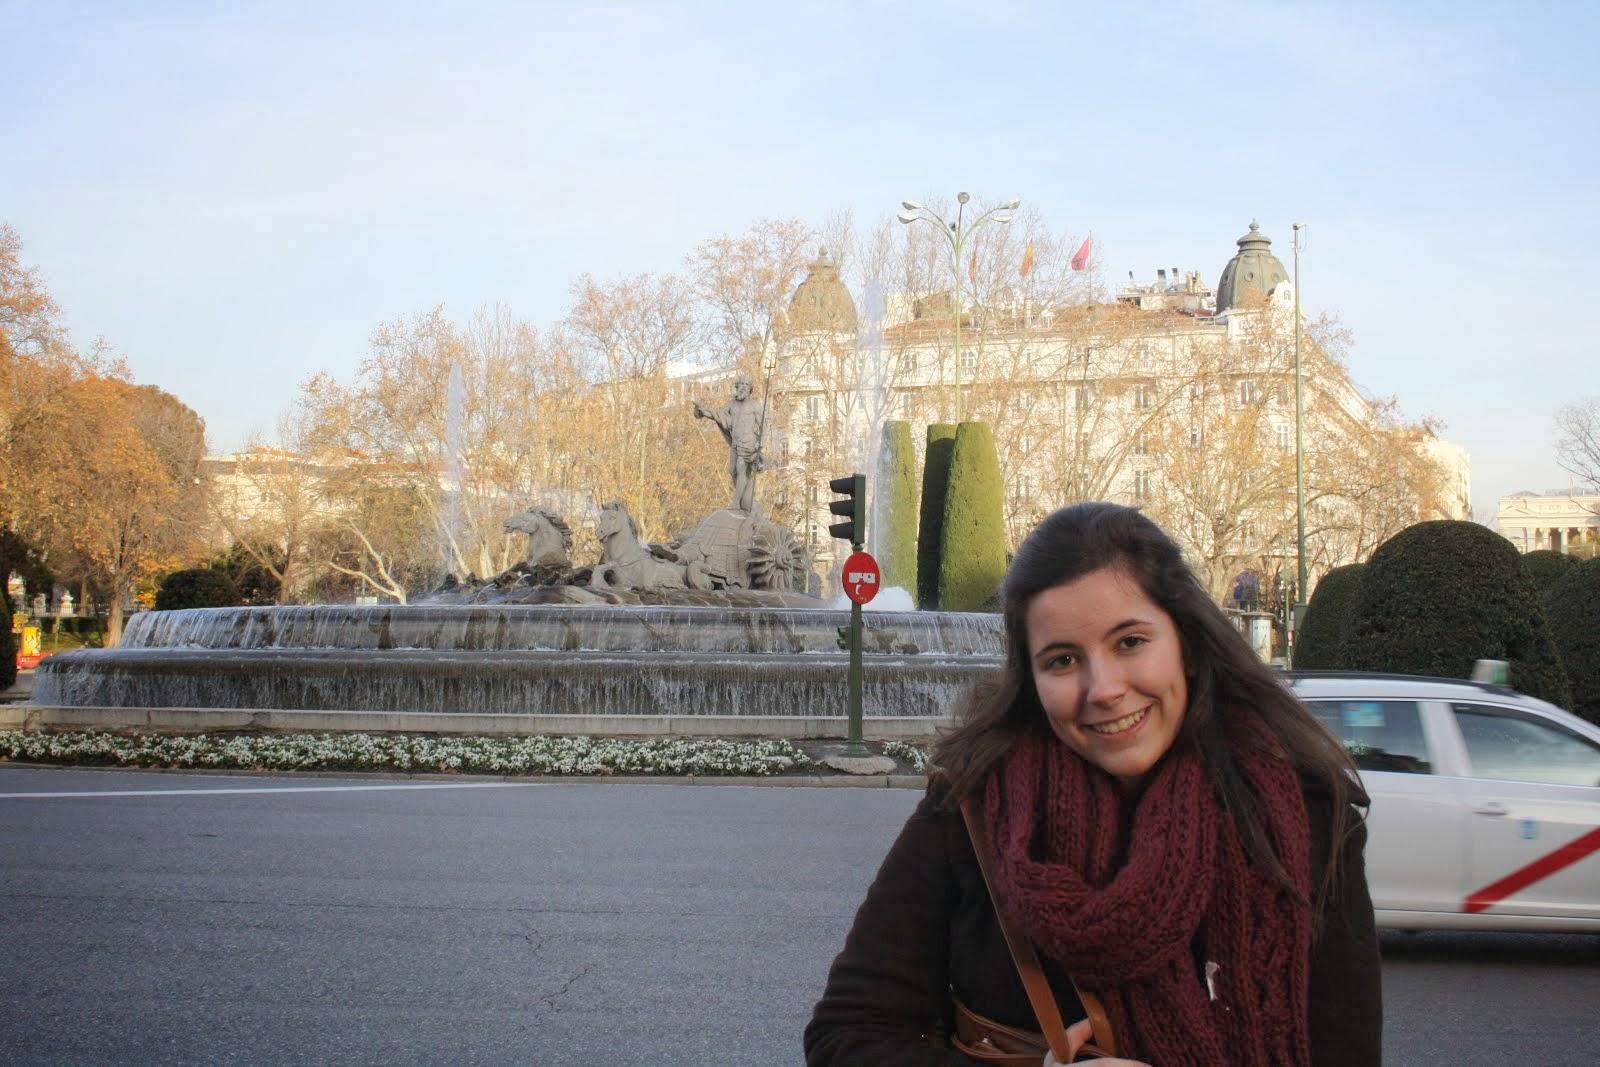 Eres mi rincón favorito de Madrid